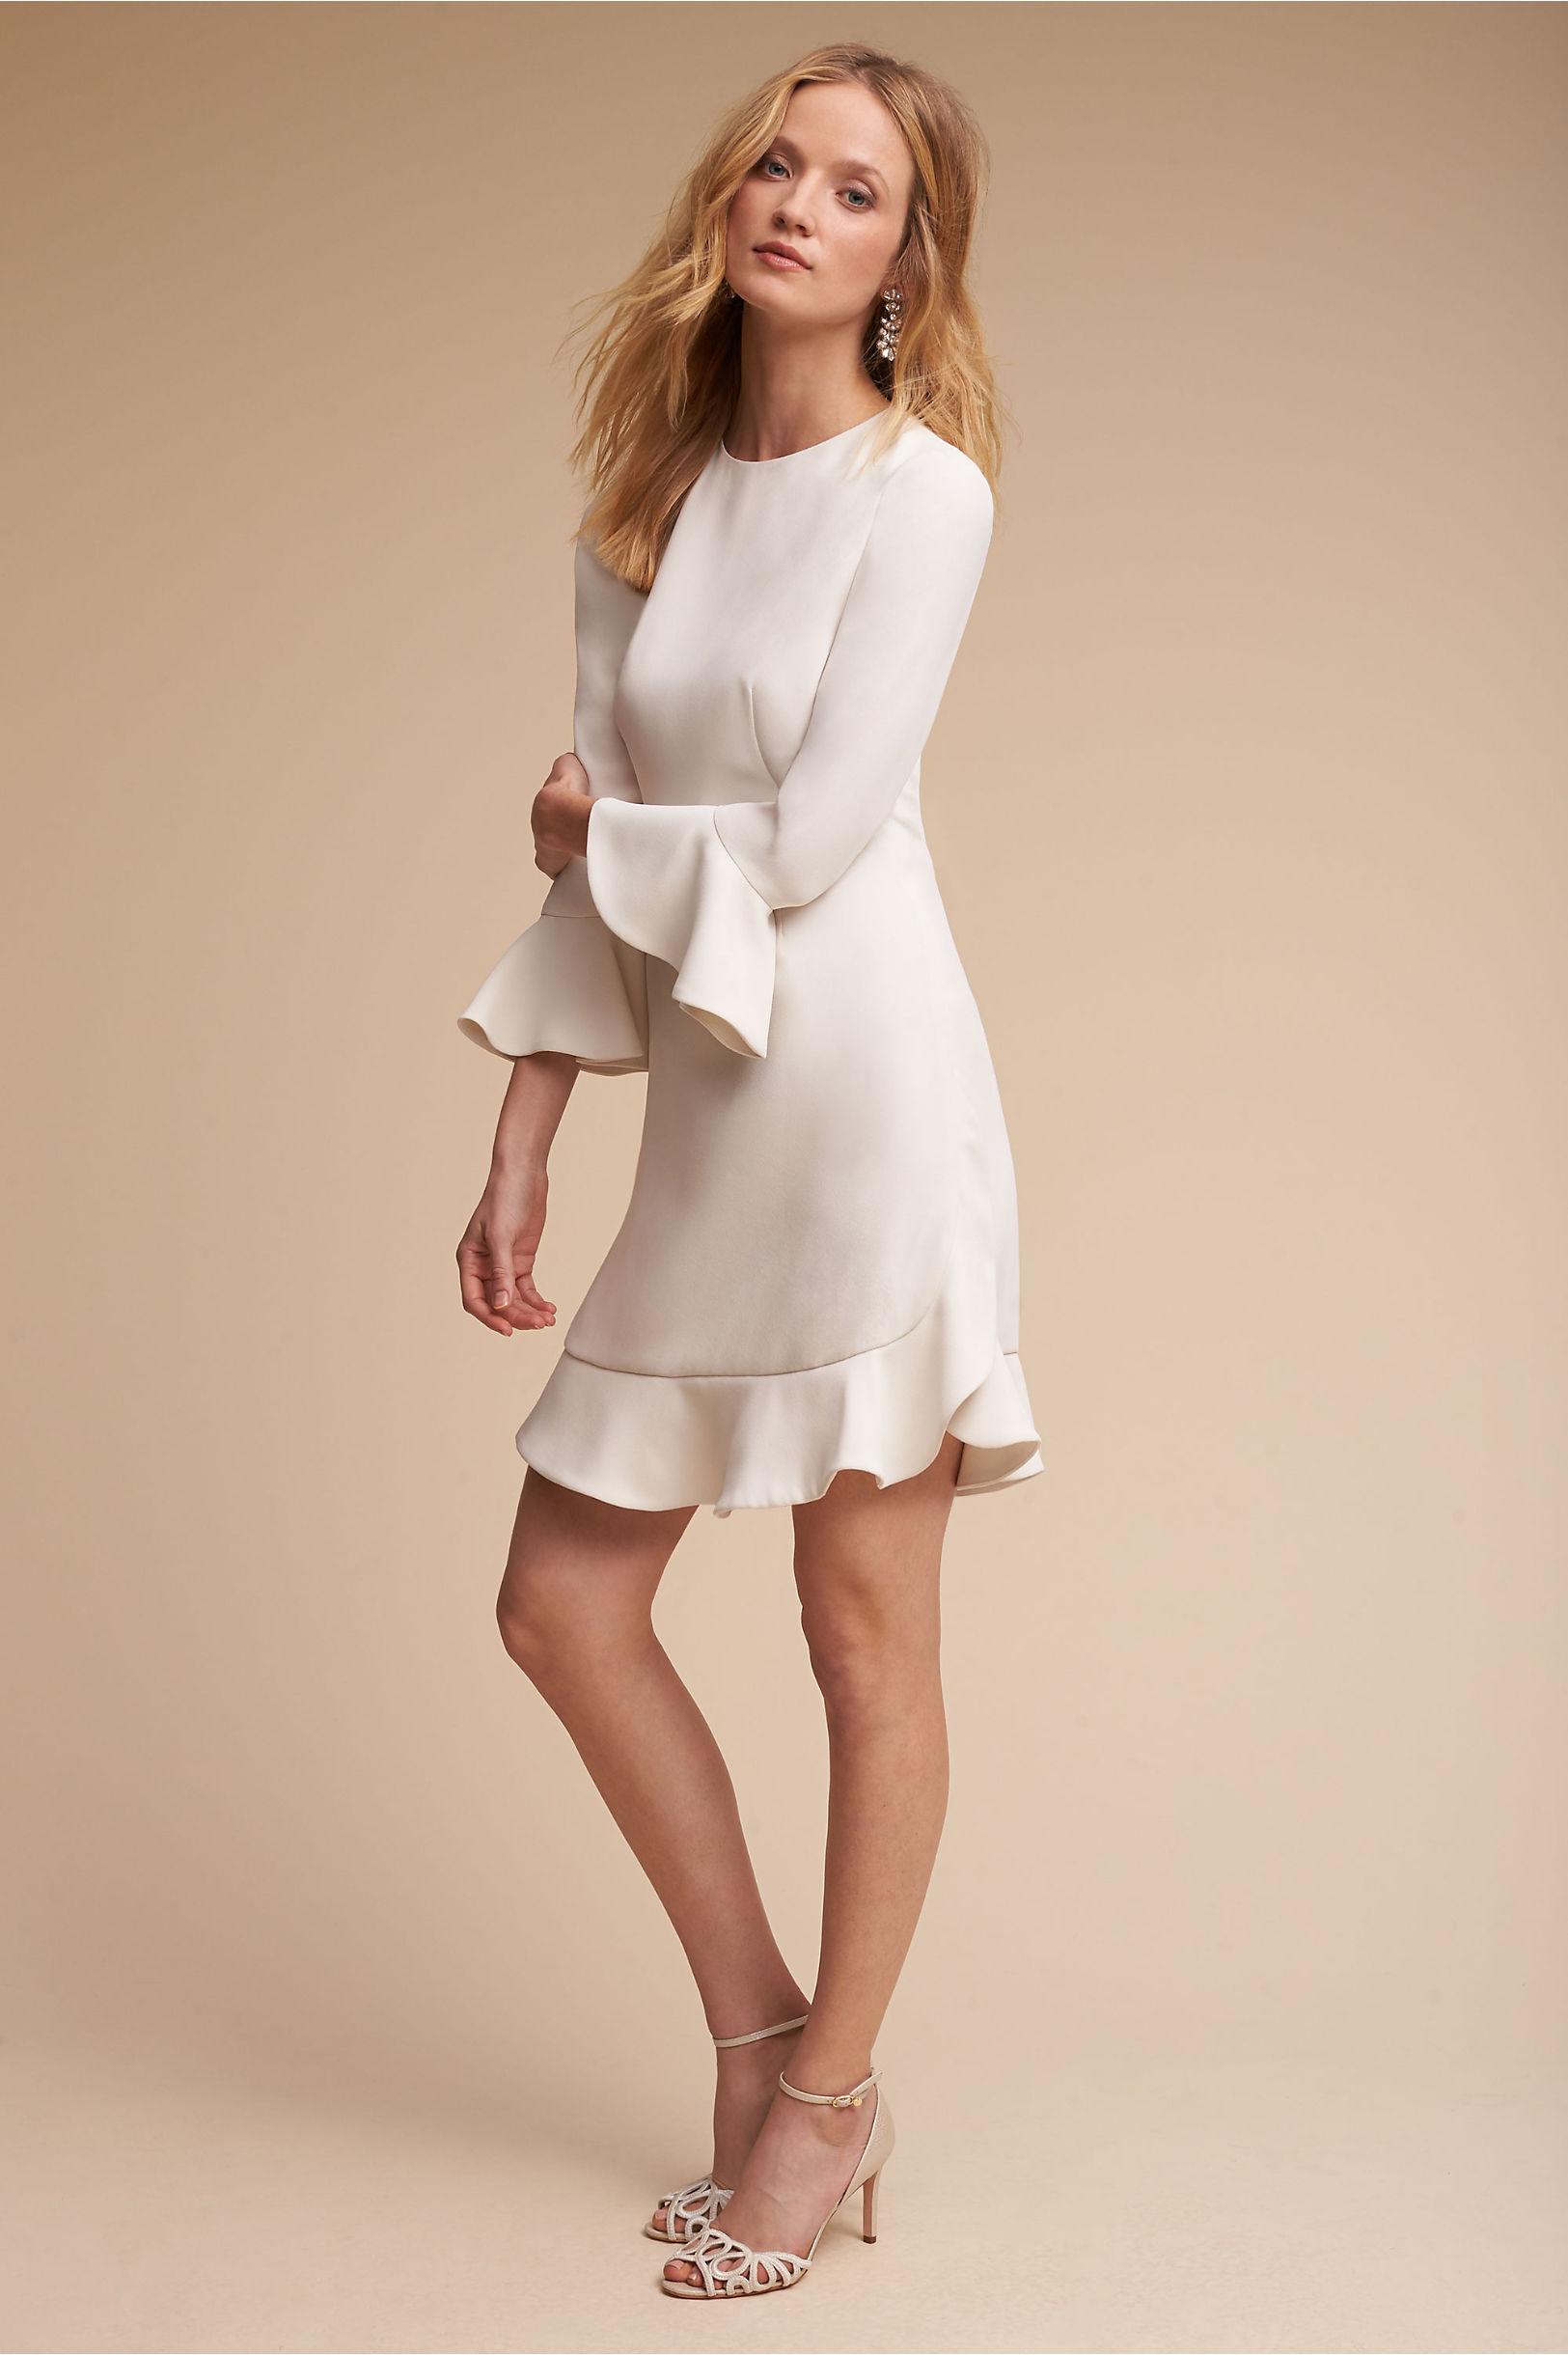 Jill Jill Stuart Ruffle Hem Dress Perfect Cheap Perfect Fast Express Exclusive Cheap Online Pay With Paypal For Sale RAktCJ0